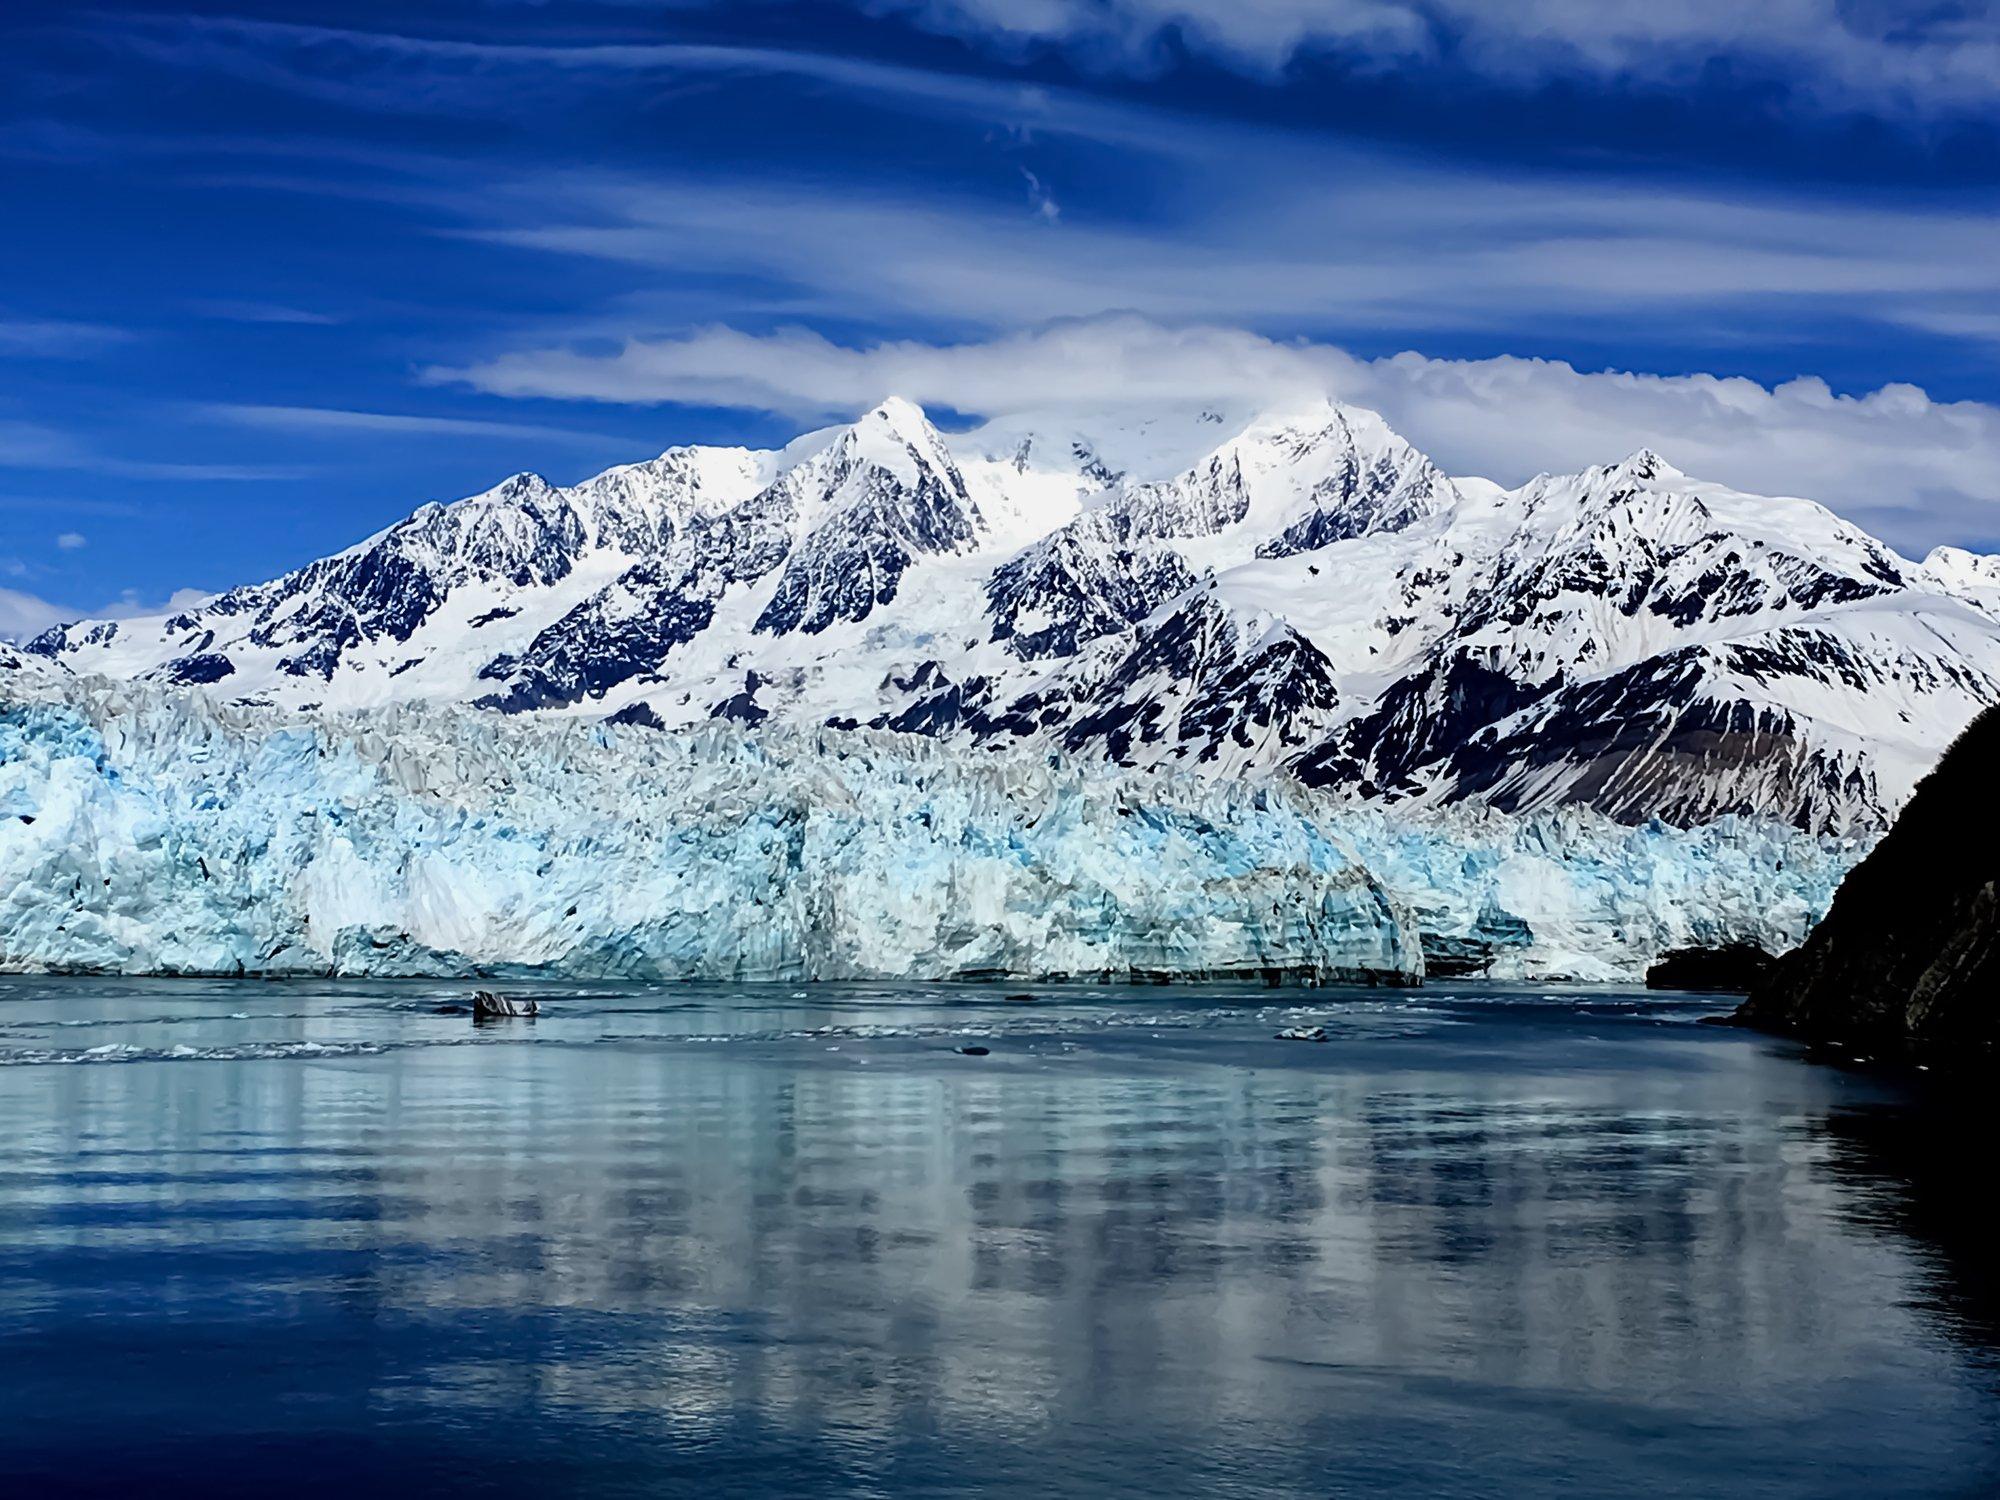 Hubbard Glacier Alaska, most sprawling American cities